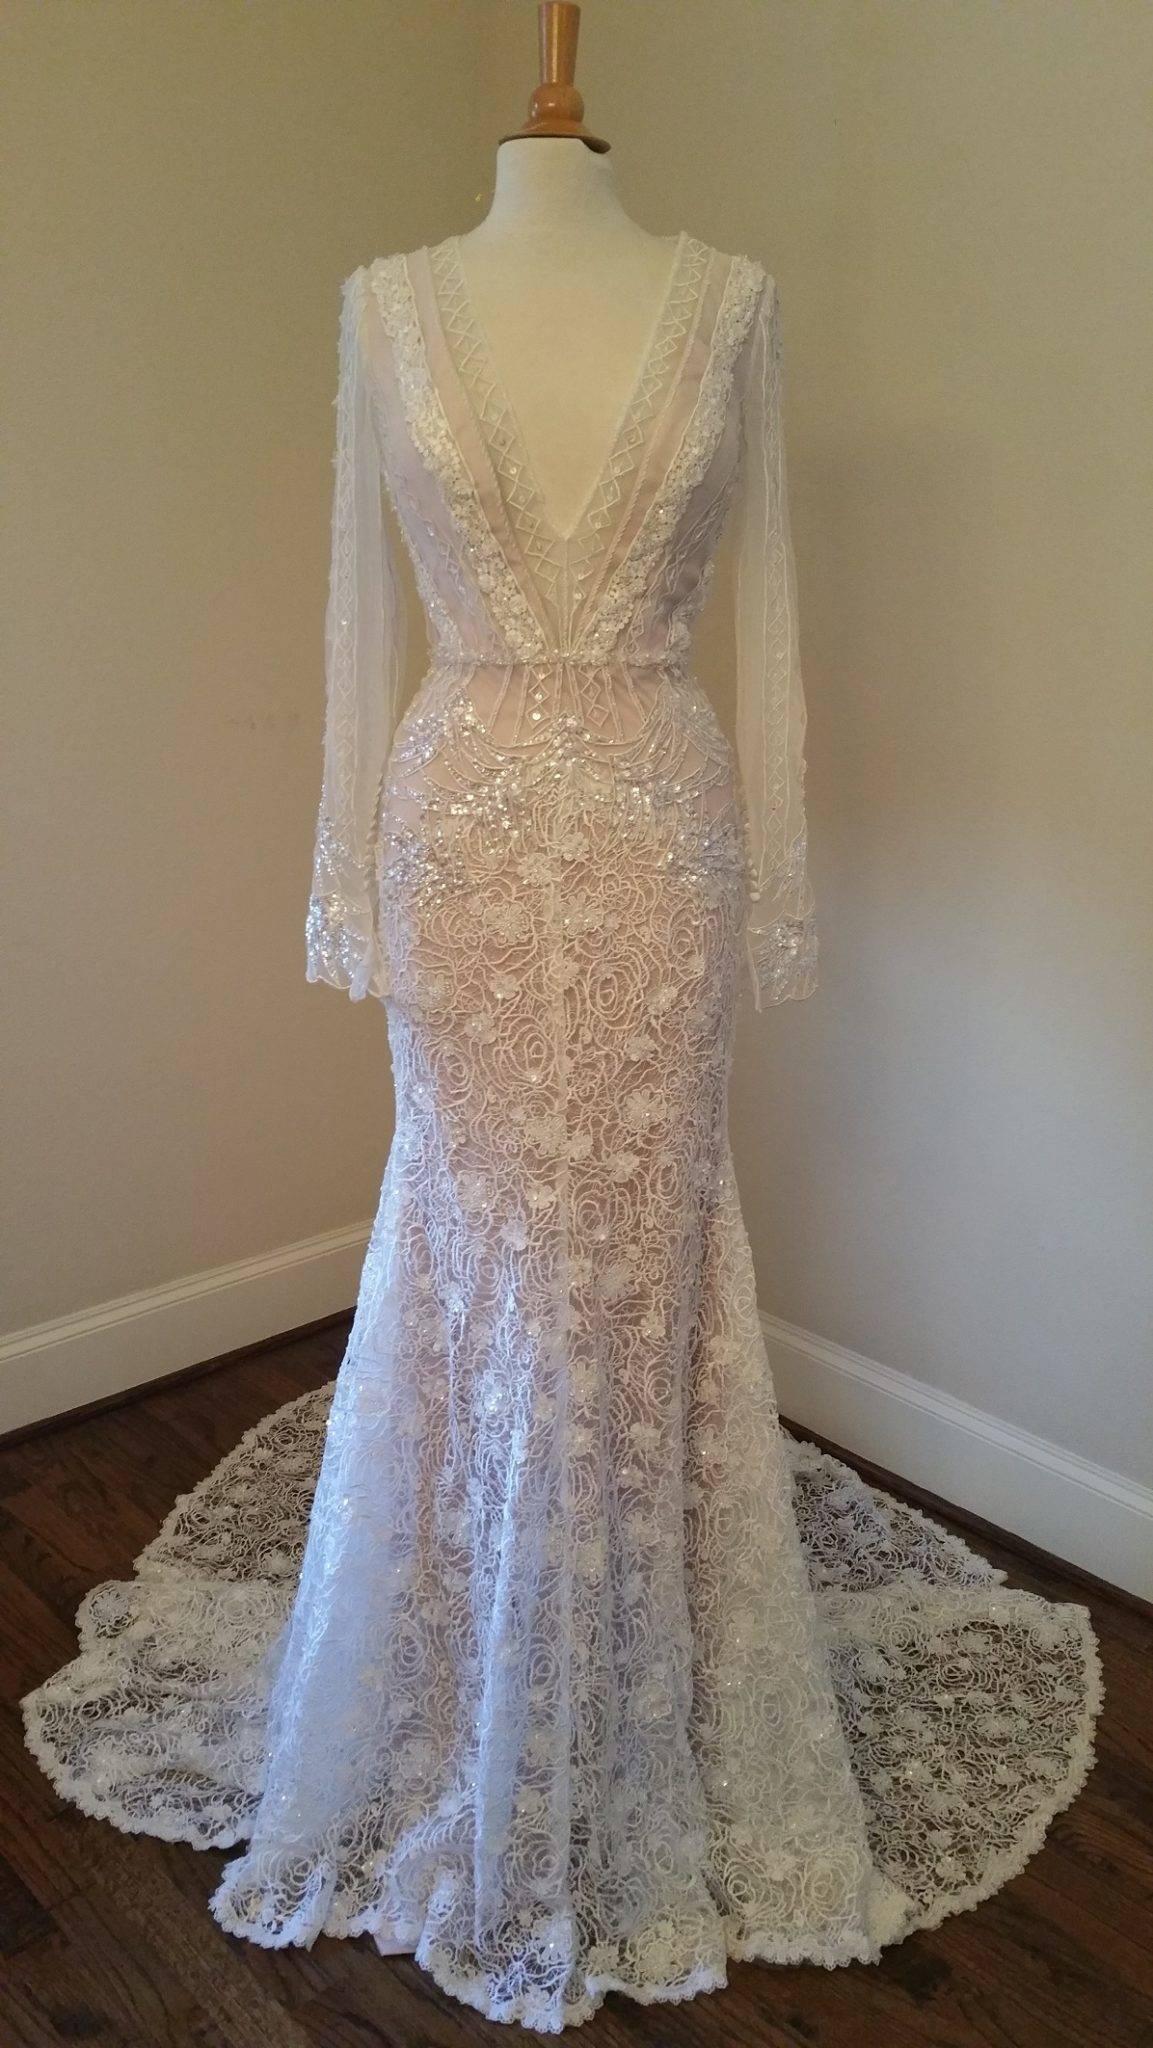 bac271233757 2016 beaded lace wedding dress inspired by inbal dror – DARIUS FASHION